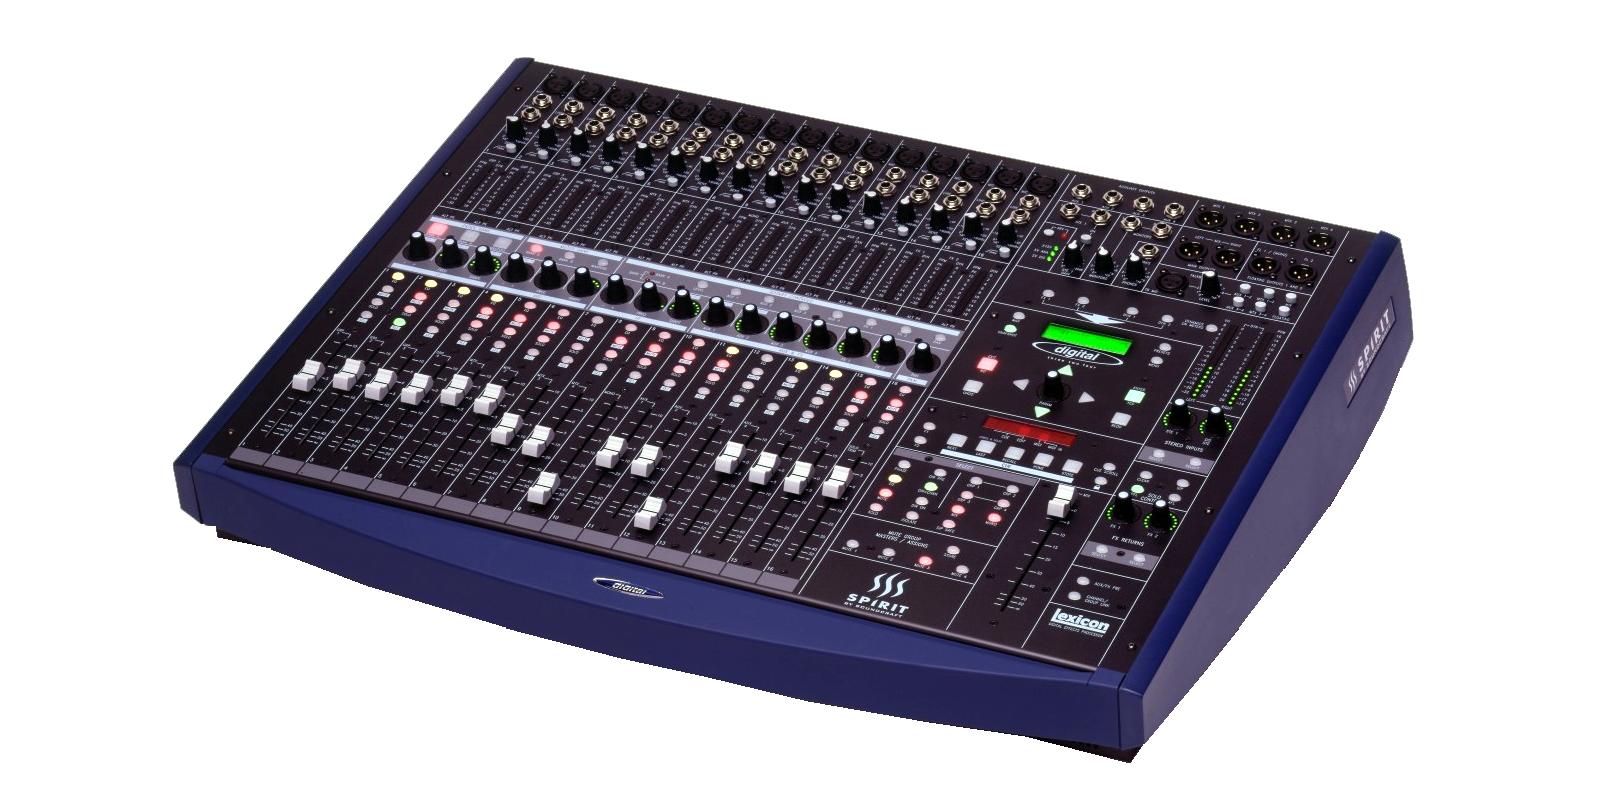 324 live soundcraft professional audio mixers rh soundcraft com User Manual Template Instruction Manual Example